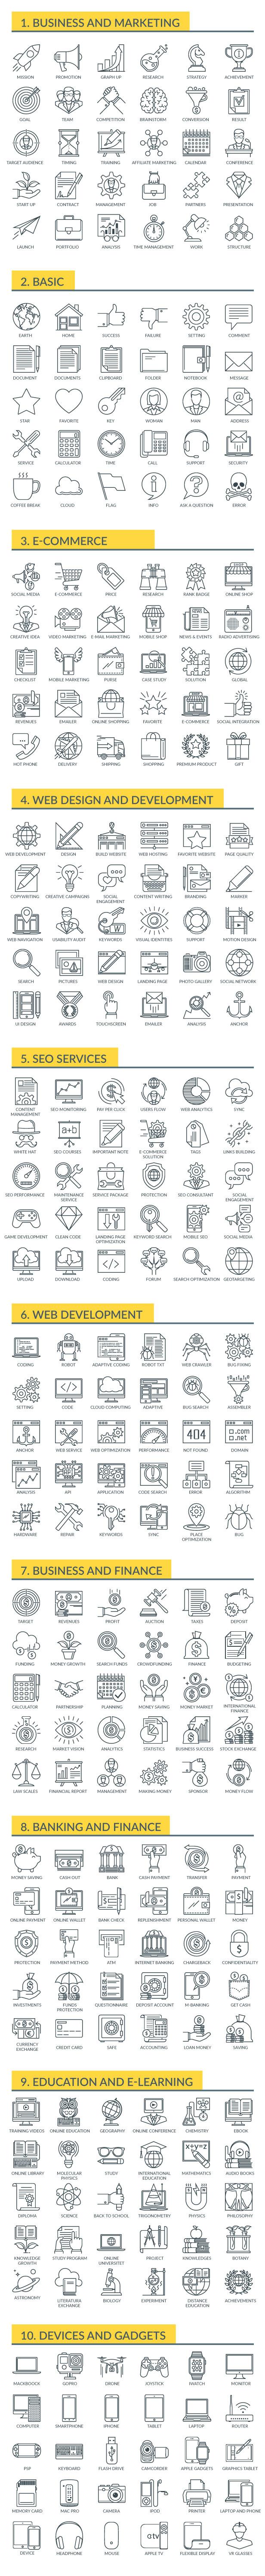 687474703a2f2f696d616765732e76666c2e72752f69692f313439383539323839352f39653837613537392f31373733353431372e6a7067 AE模板:390组公司企业社交网页金融旅行矢量图标动画预设 Line Icons Pack 390 Animated Icons